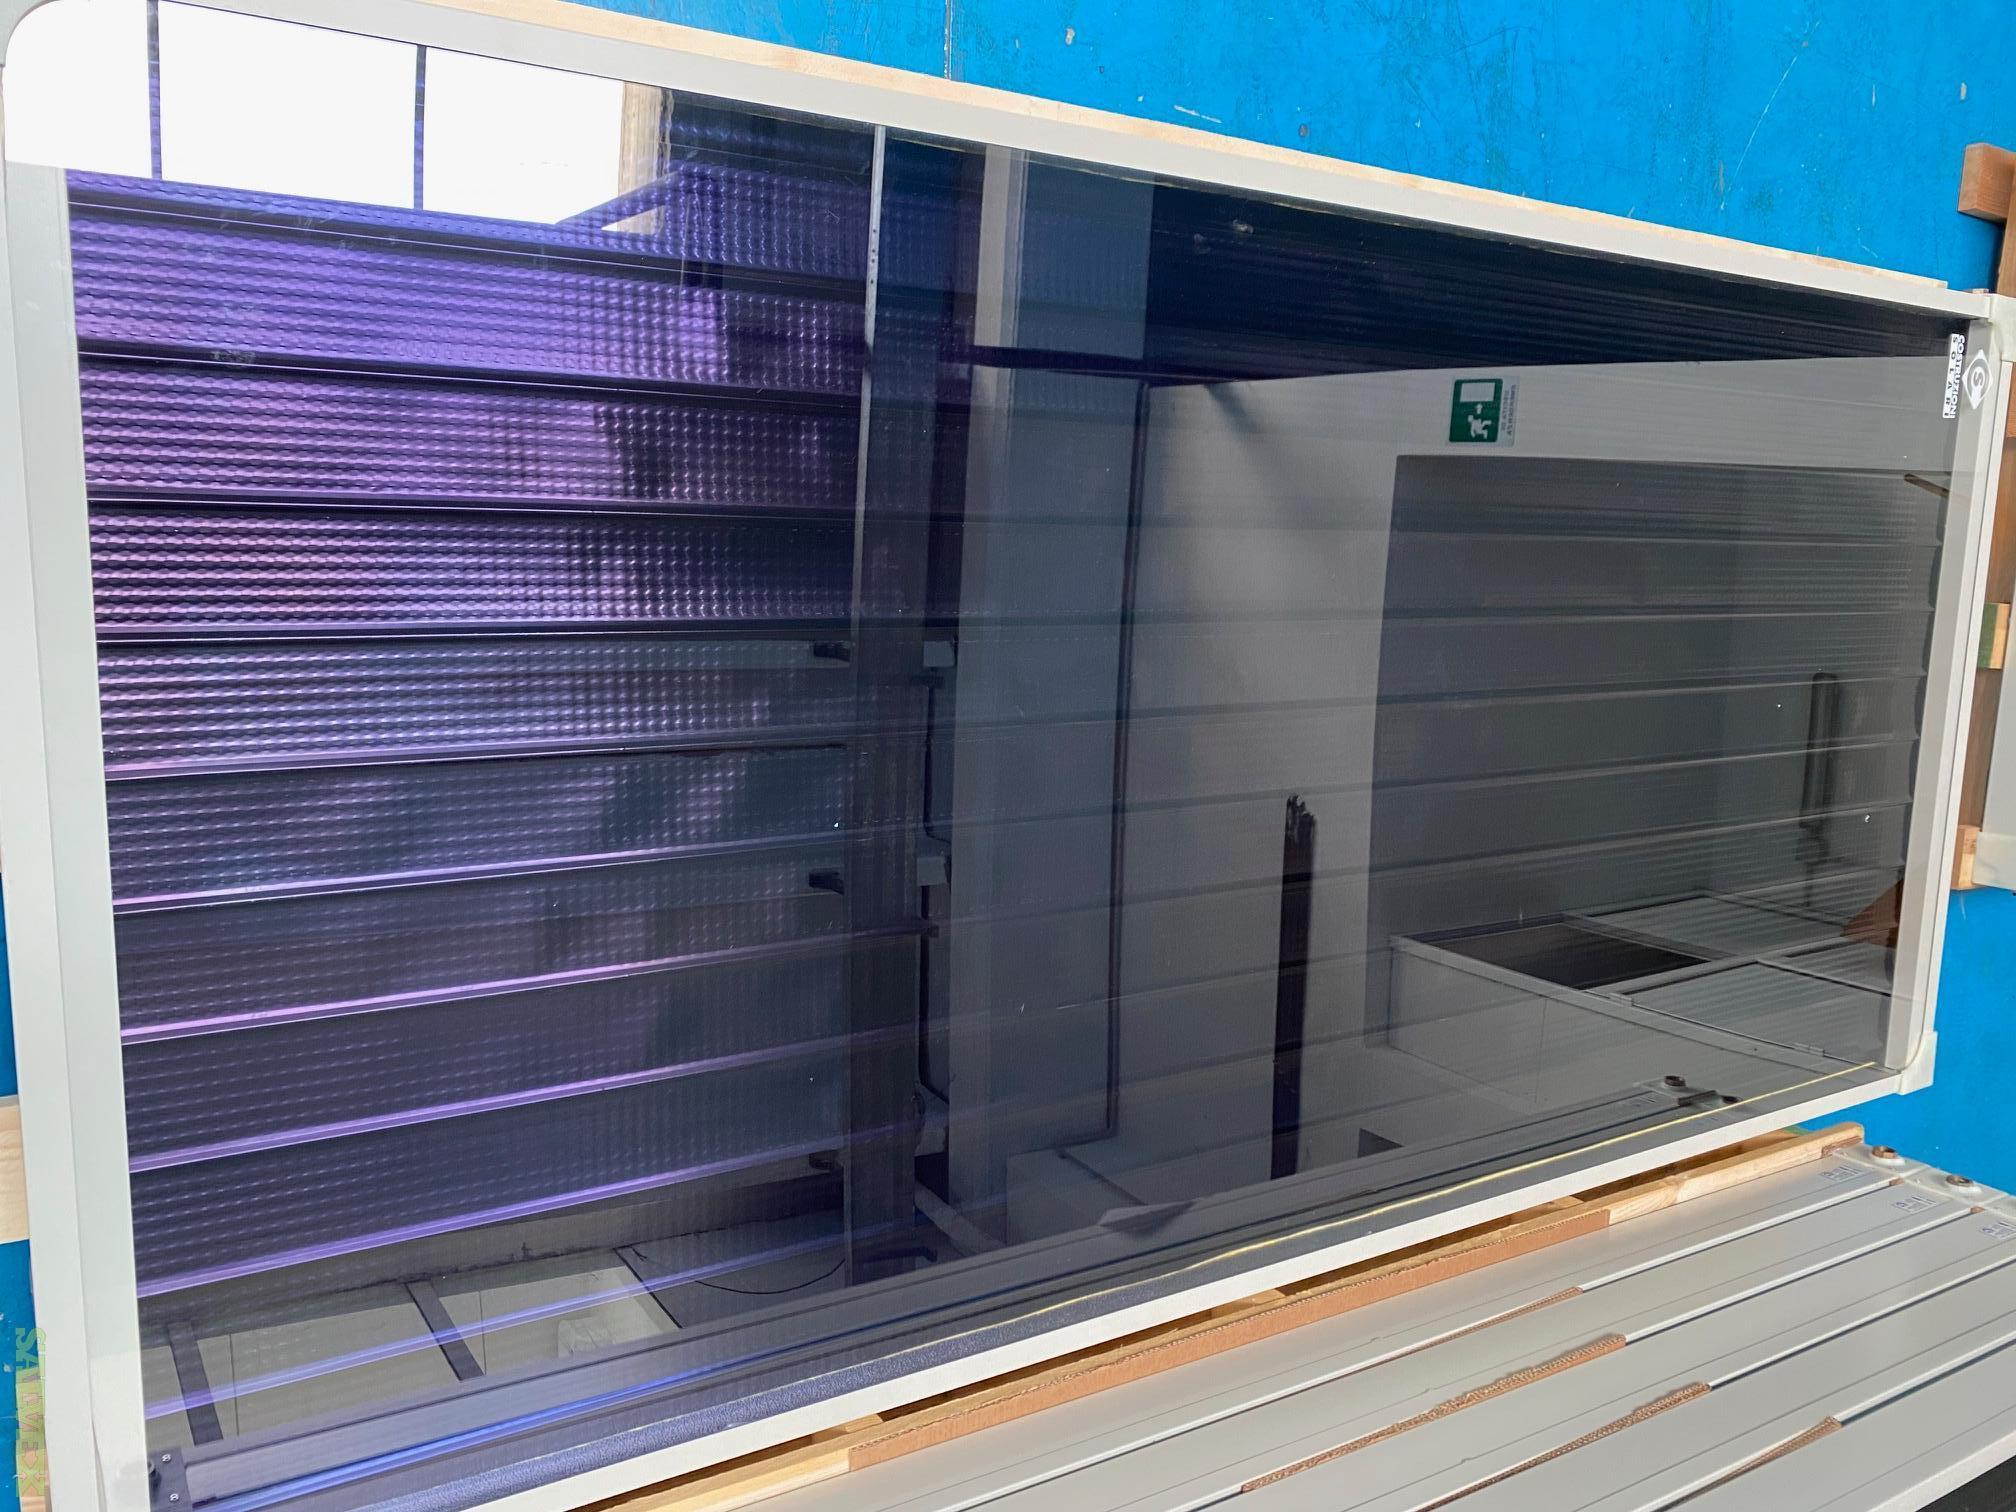 Panda 2.7 sqm Thermal Solar Panels - for Hot Water (2,000 Units)